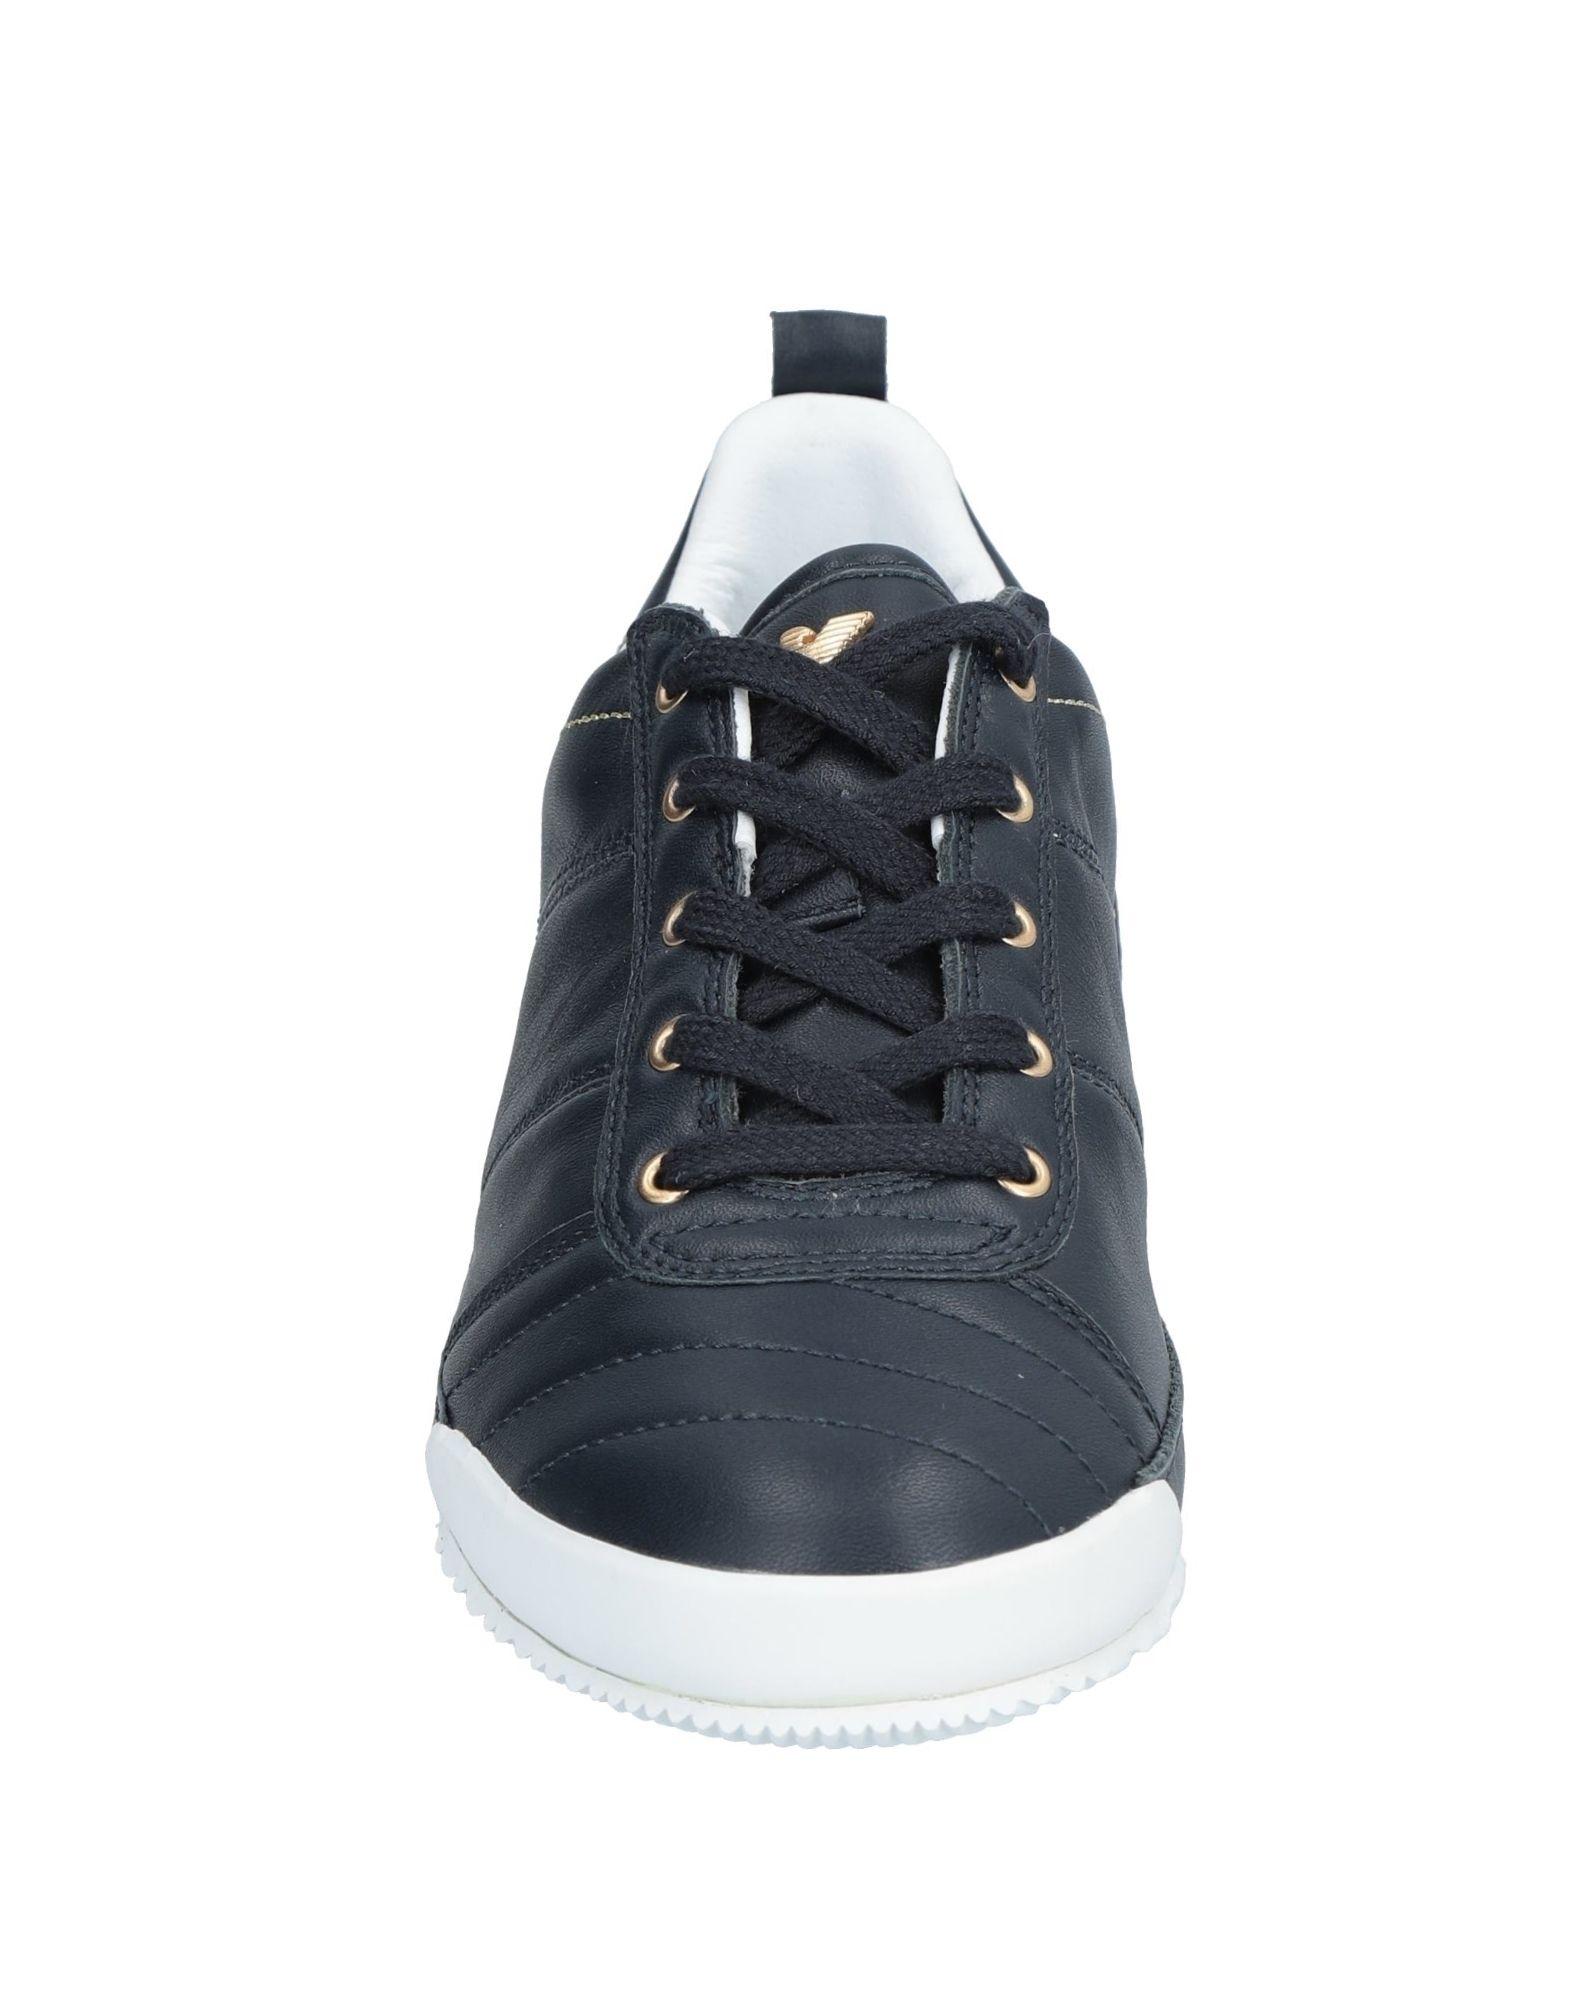 Gut um Jeans billige Schuhe zu tragenArmani Jeans um Sneakers Damen  11535715HX 0087d9